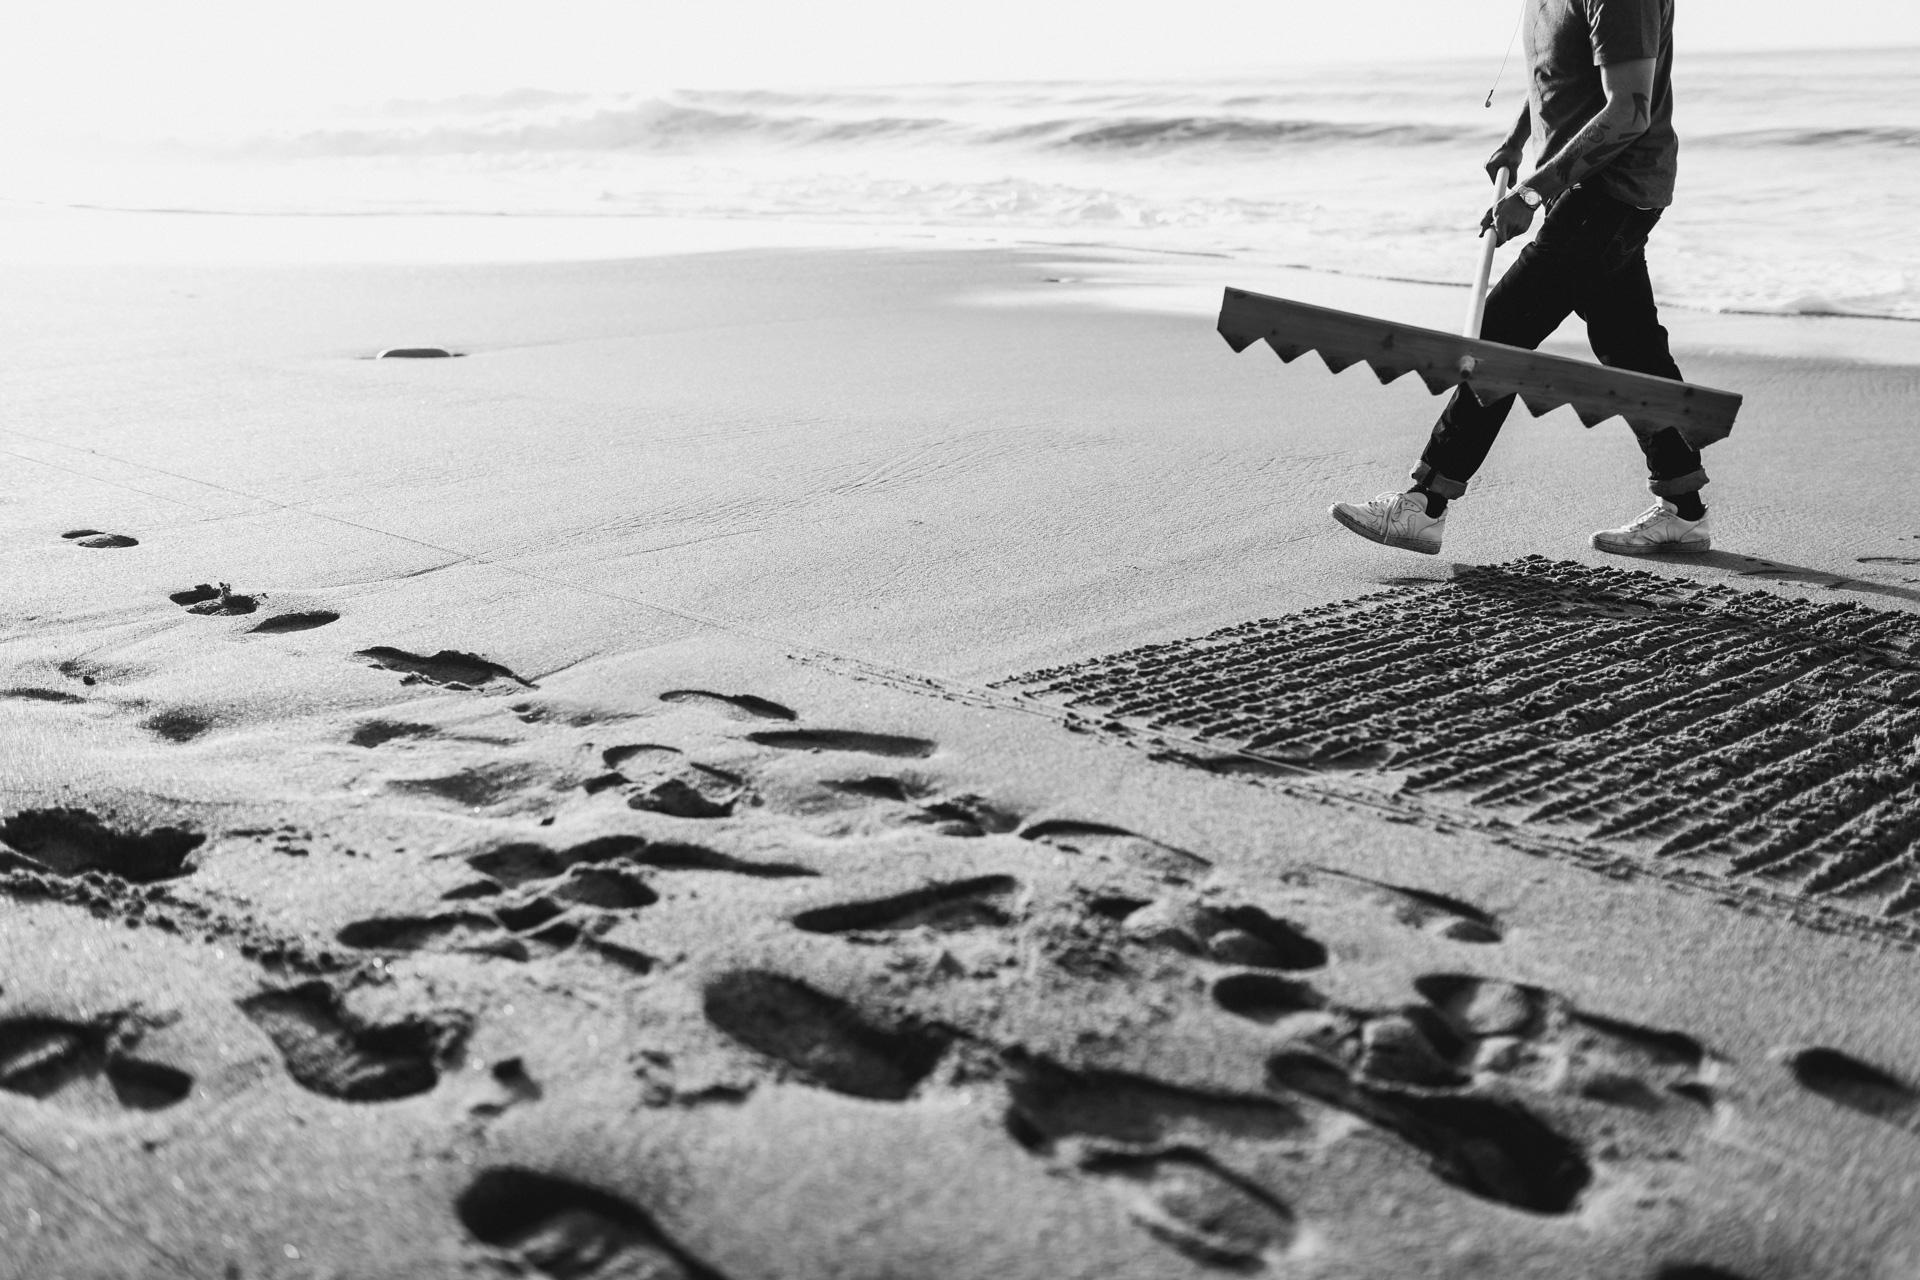 Damien-dohmen-sand-print-lx-one-2